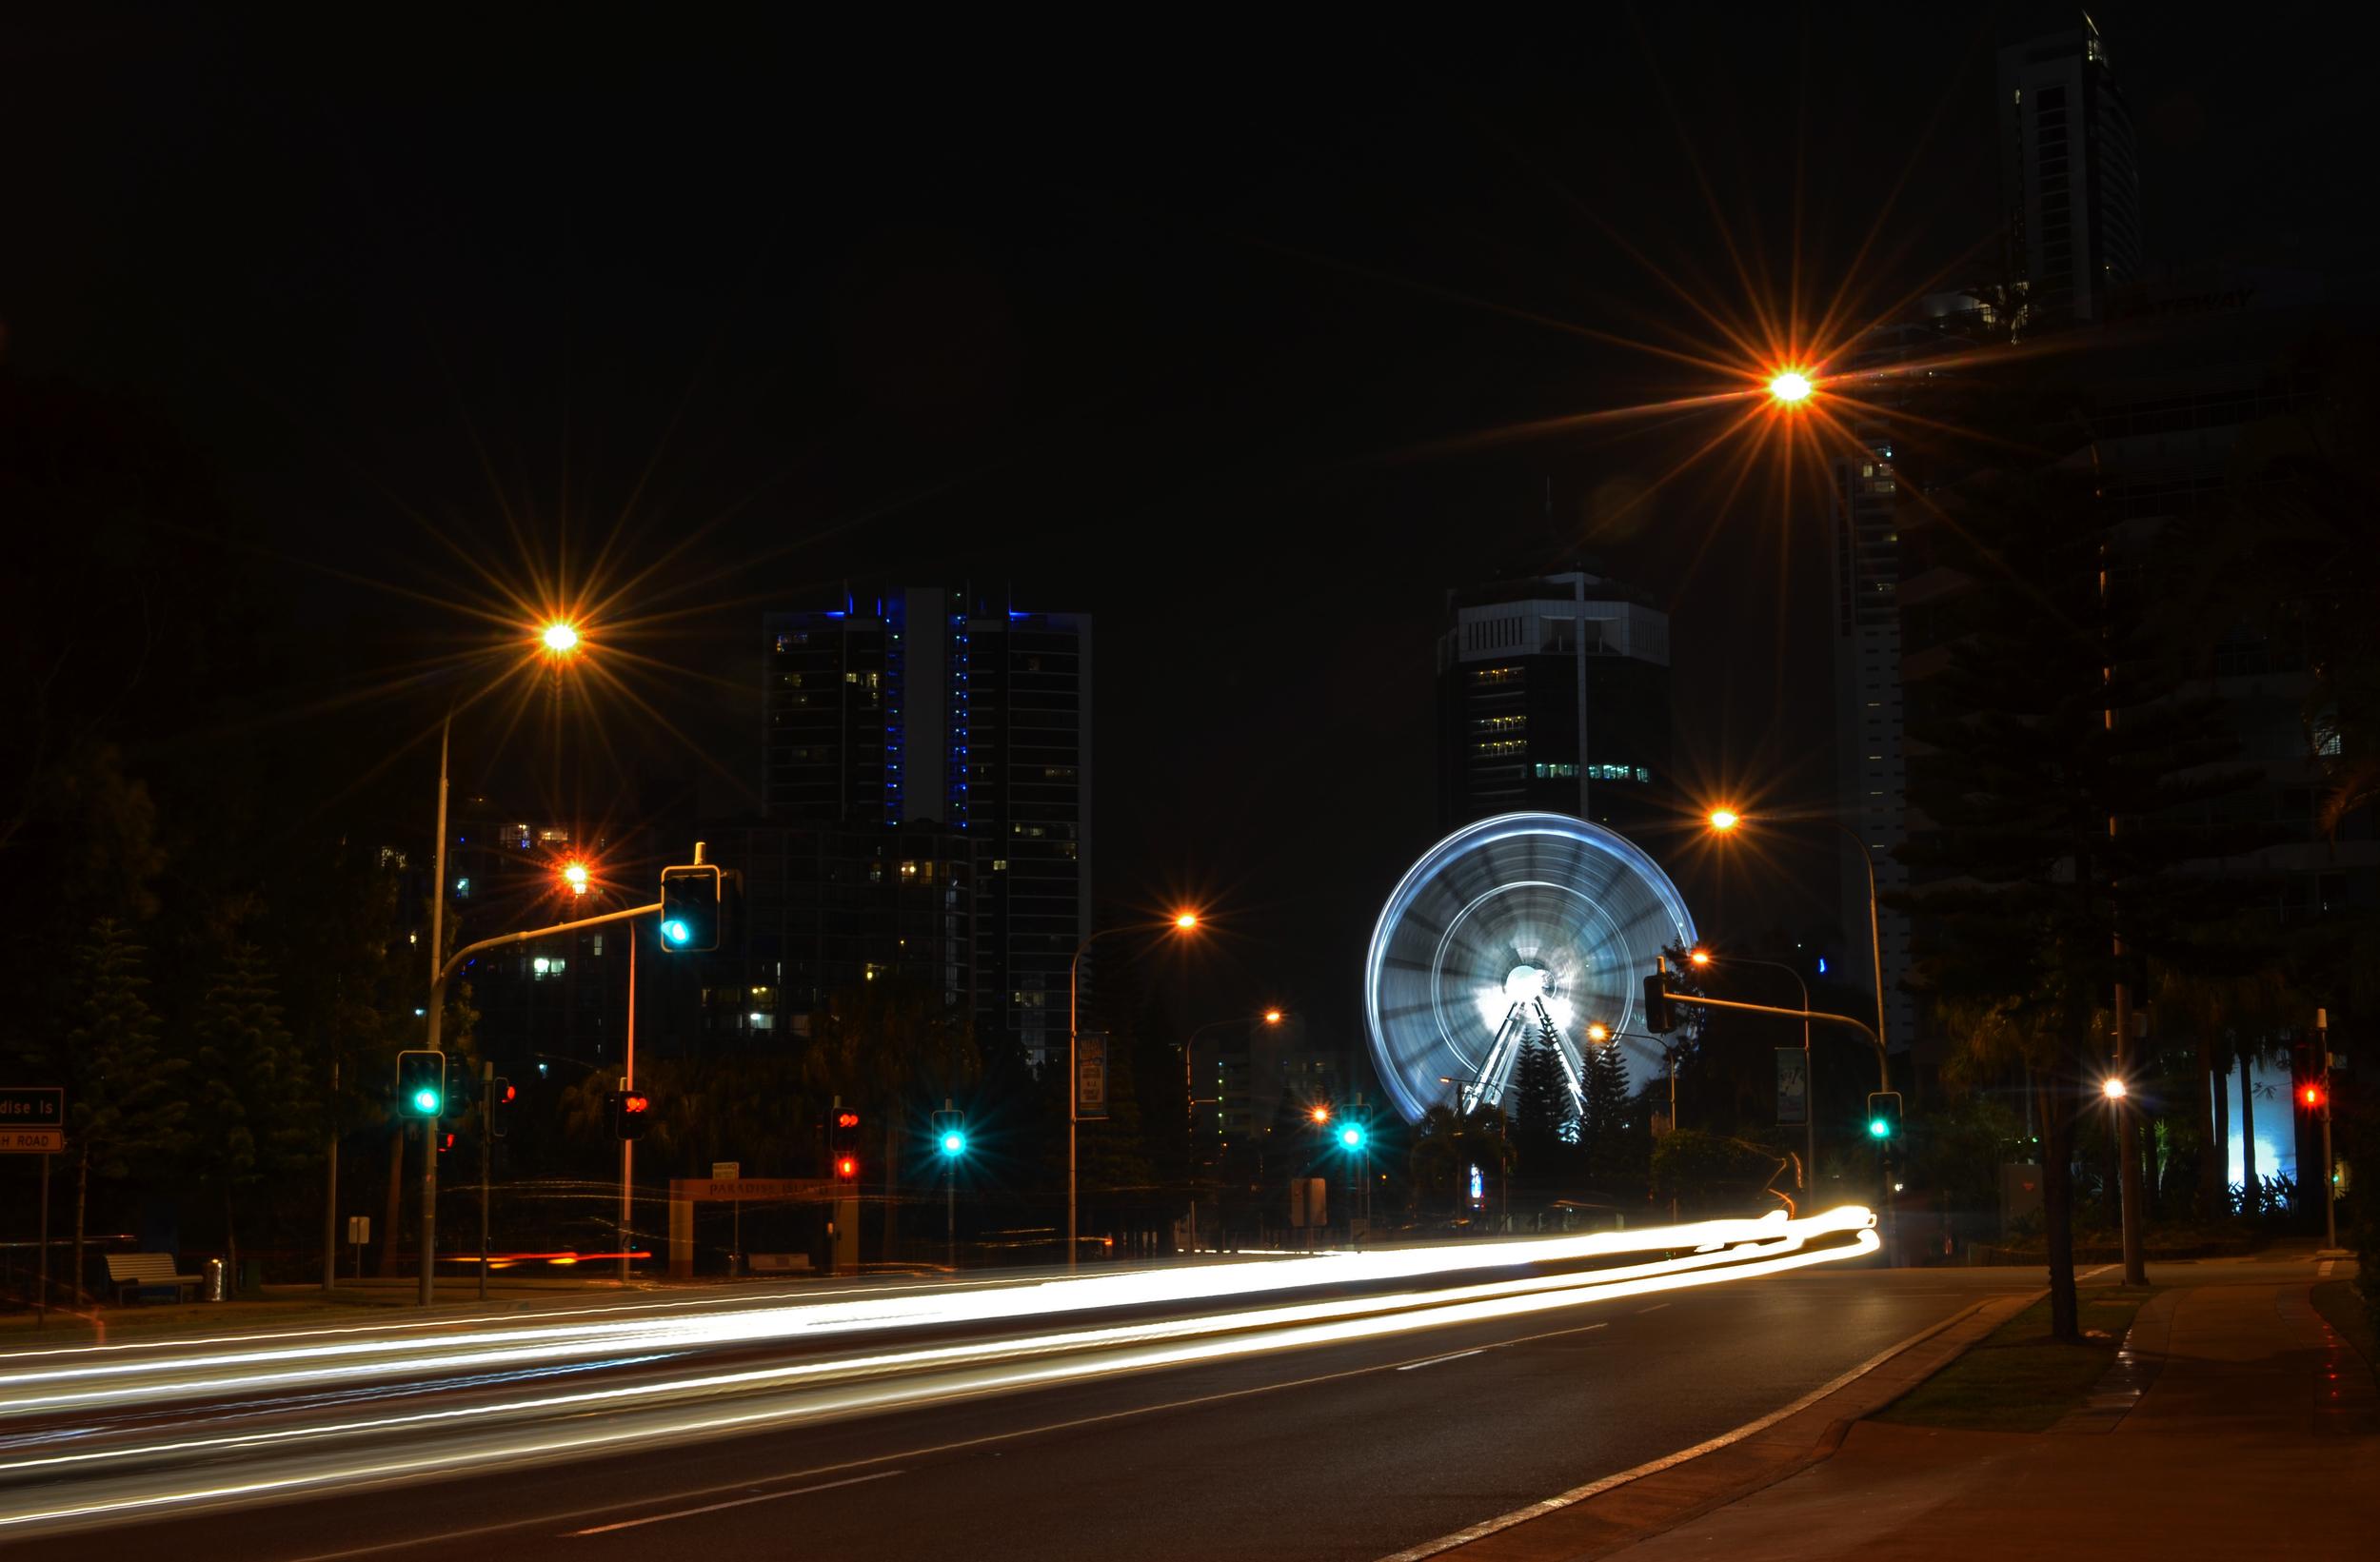 [15] The Ferris Wheel, Gold Coast.